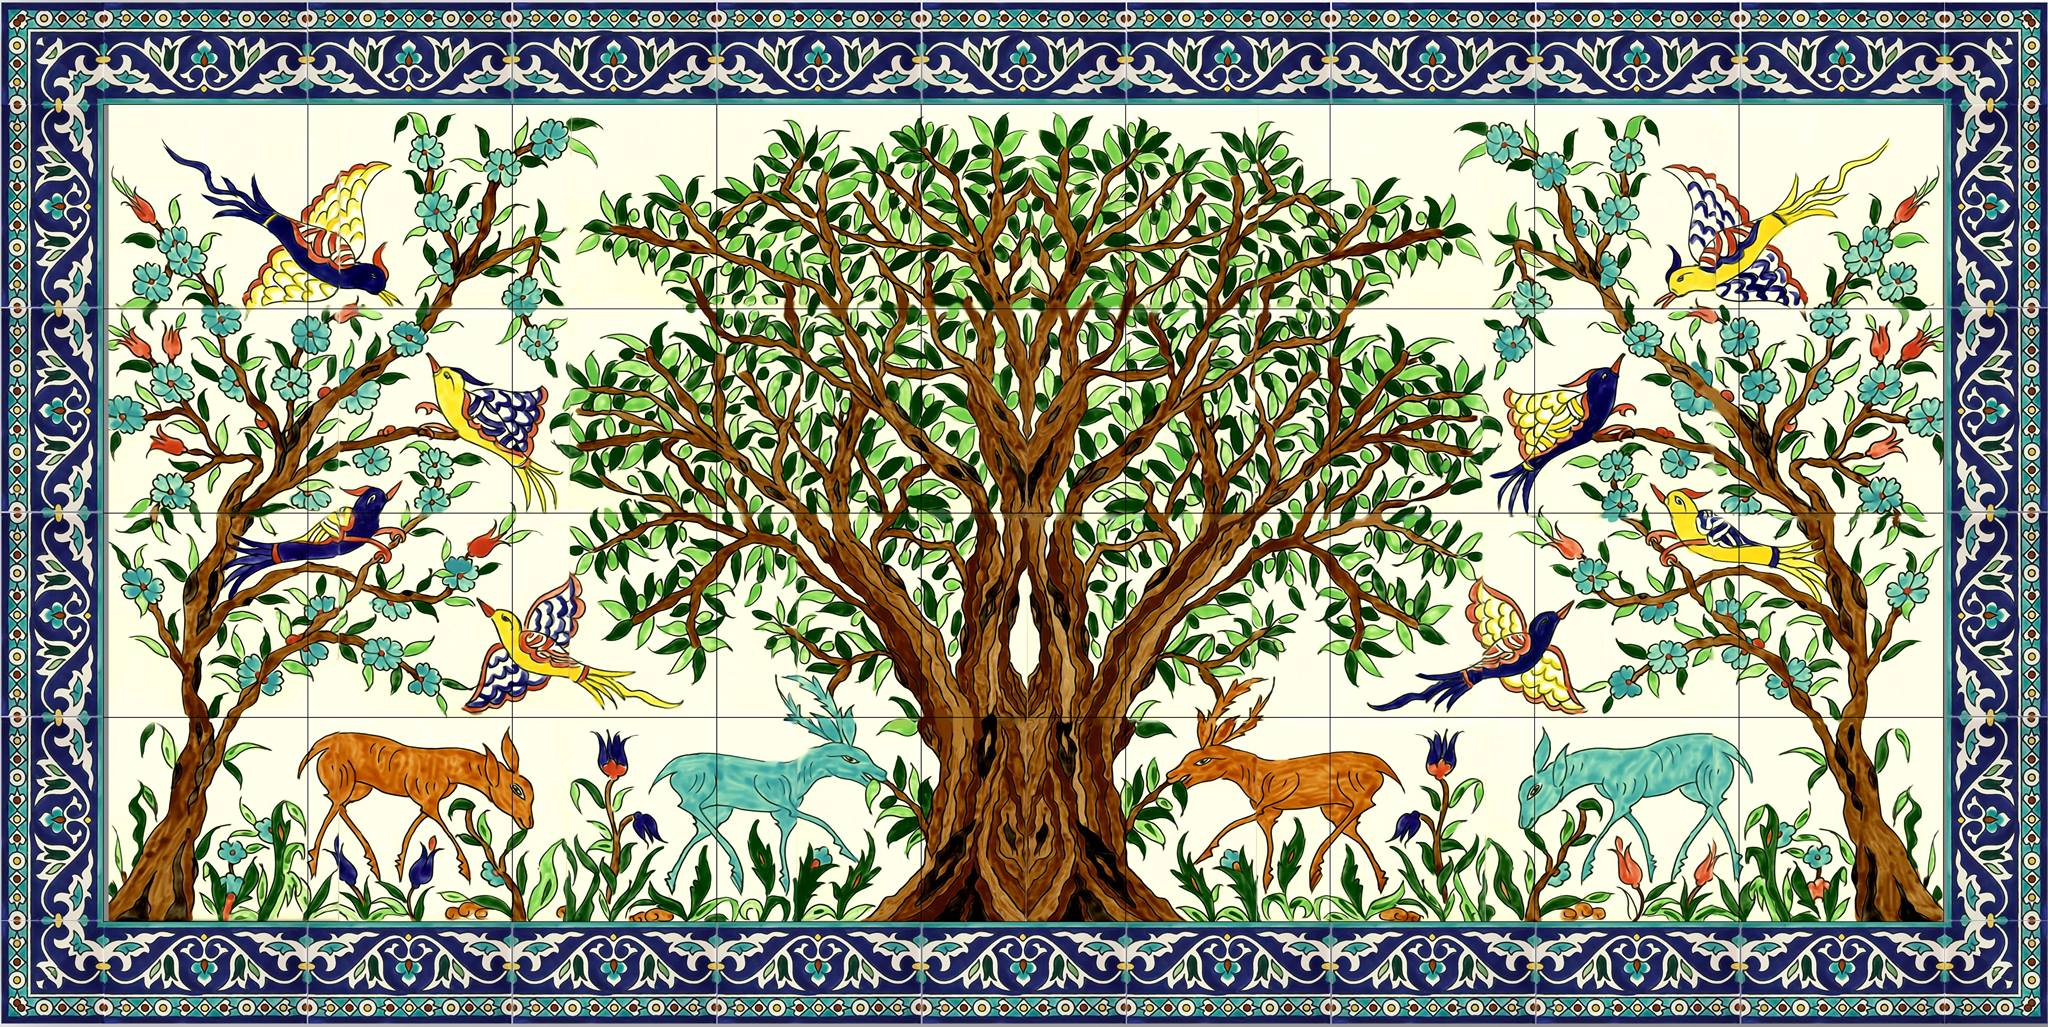 Animal, Plant, Ornament / Armenian Ceramics – Balian Family